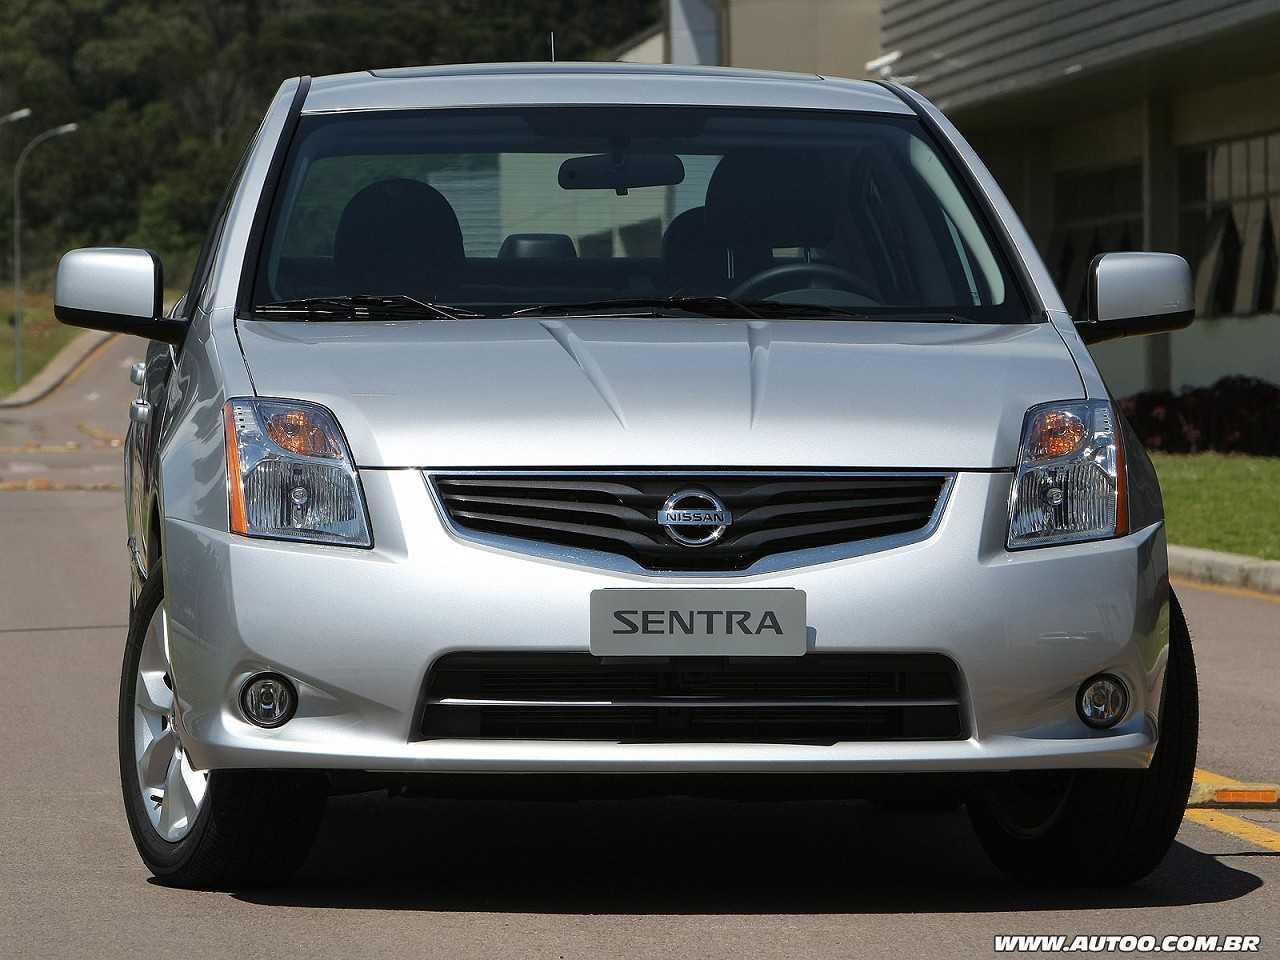 NissanSentra 2010 - frente